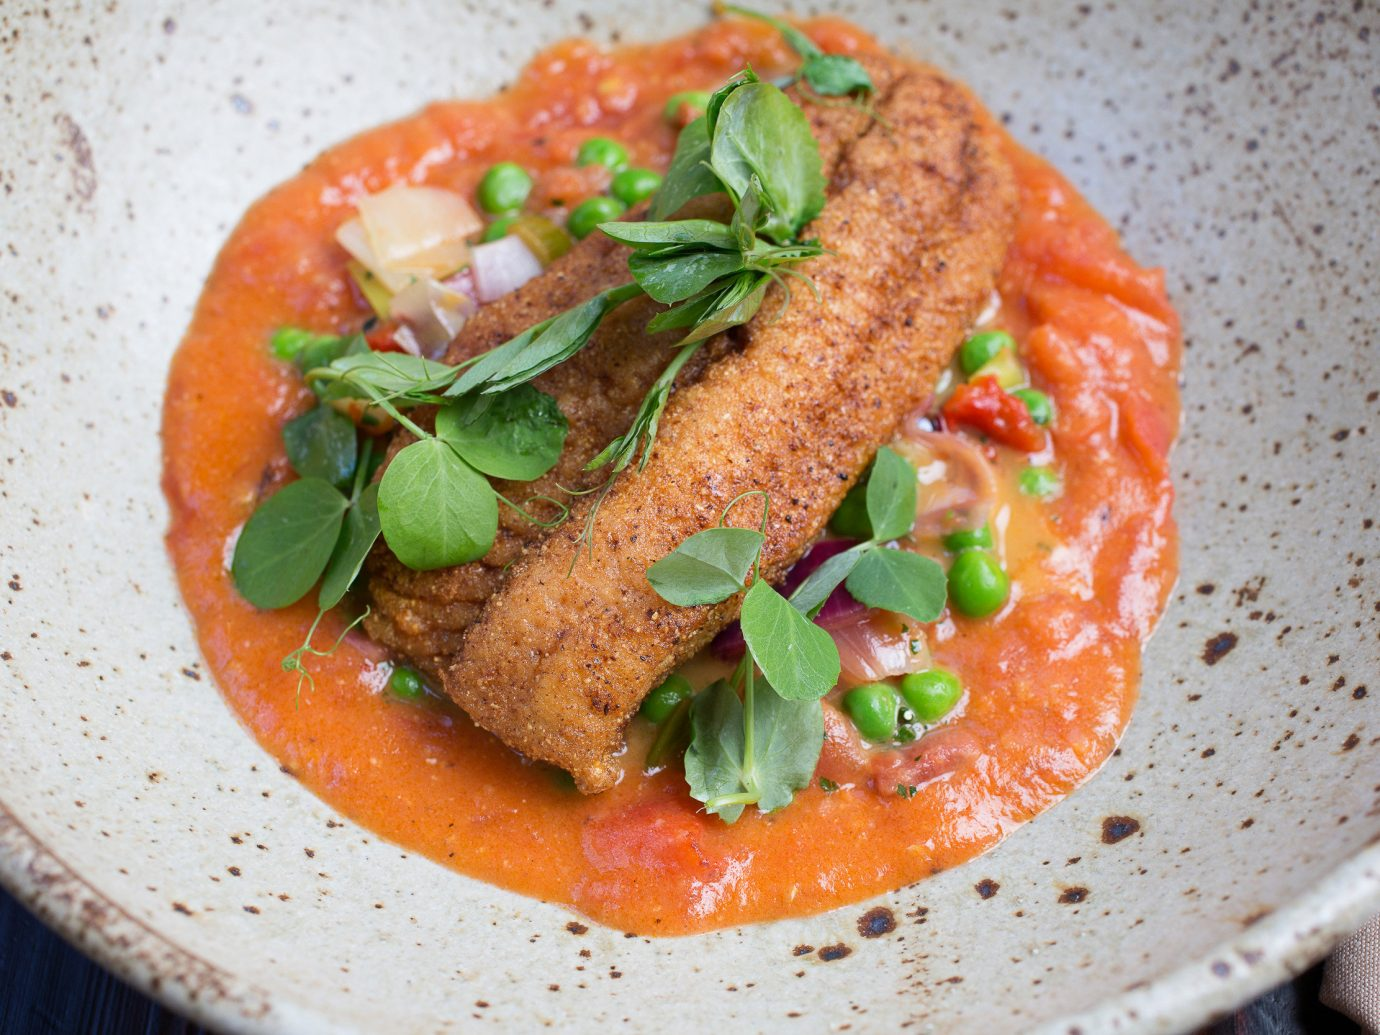 fish dish from Husk restaurant in Charlotte.